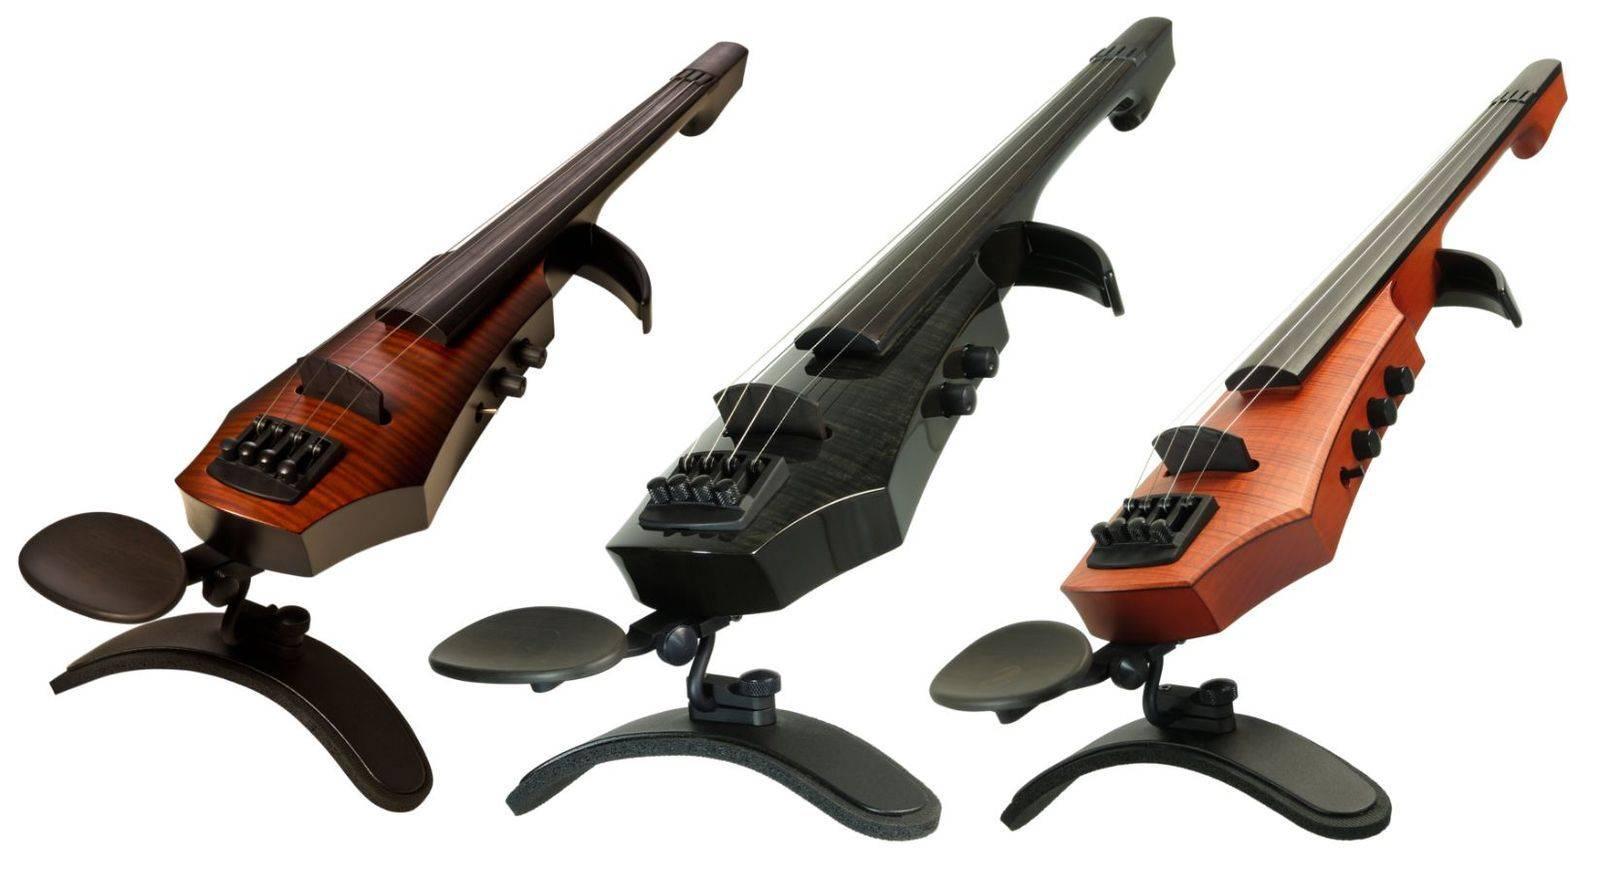 Different NS Design Violin